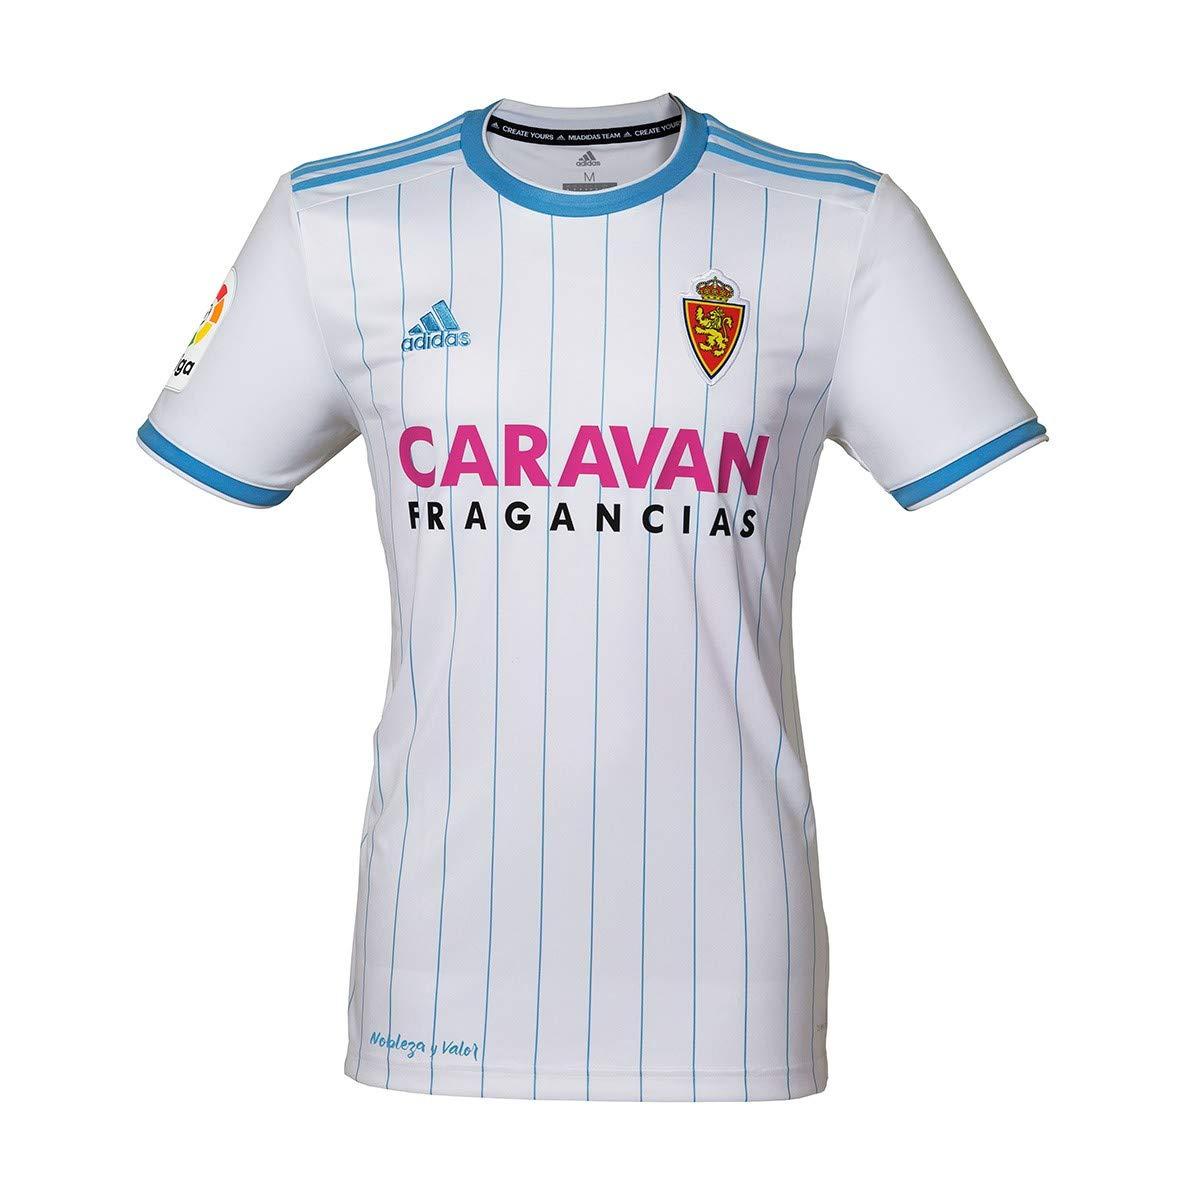 adidas Real Zaragoza Primera Equipación 2018-2019, Camiseta, White-Light Blue, Talla 2XL: Amazon.es: Deportes y aire libre